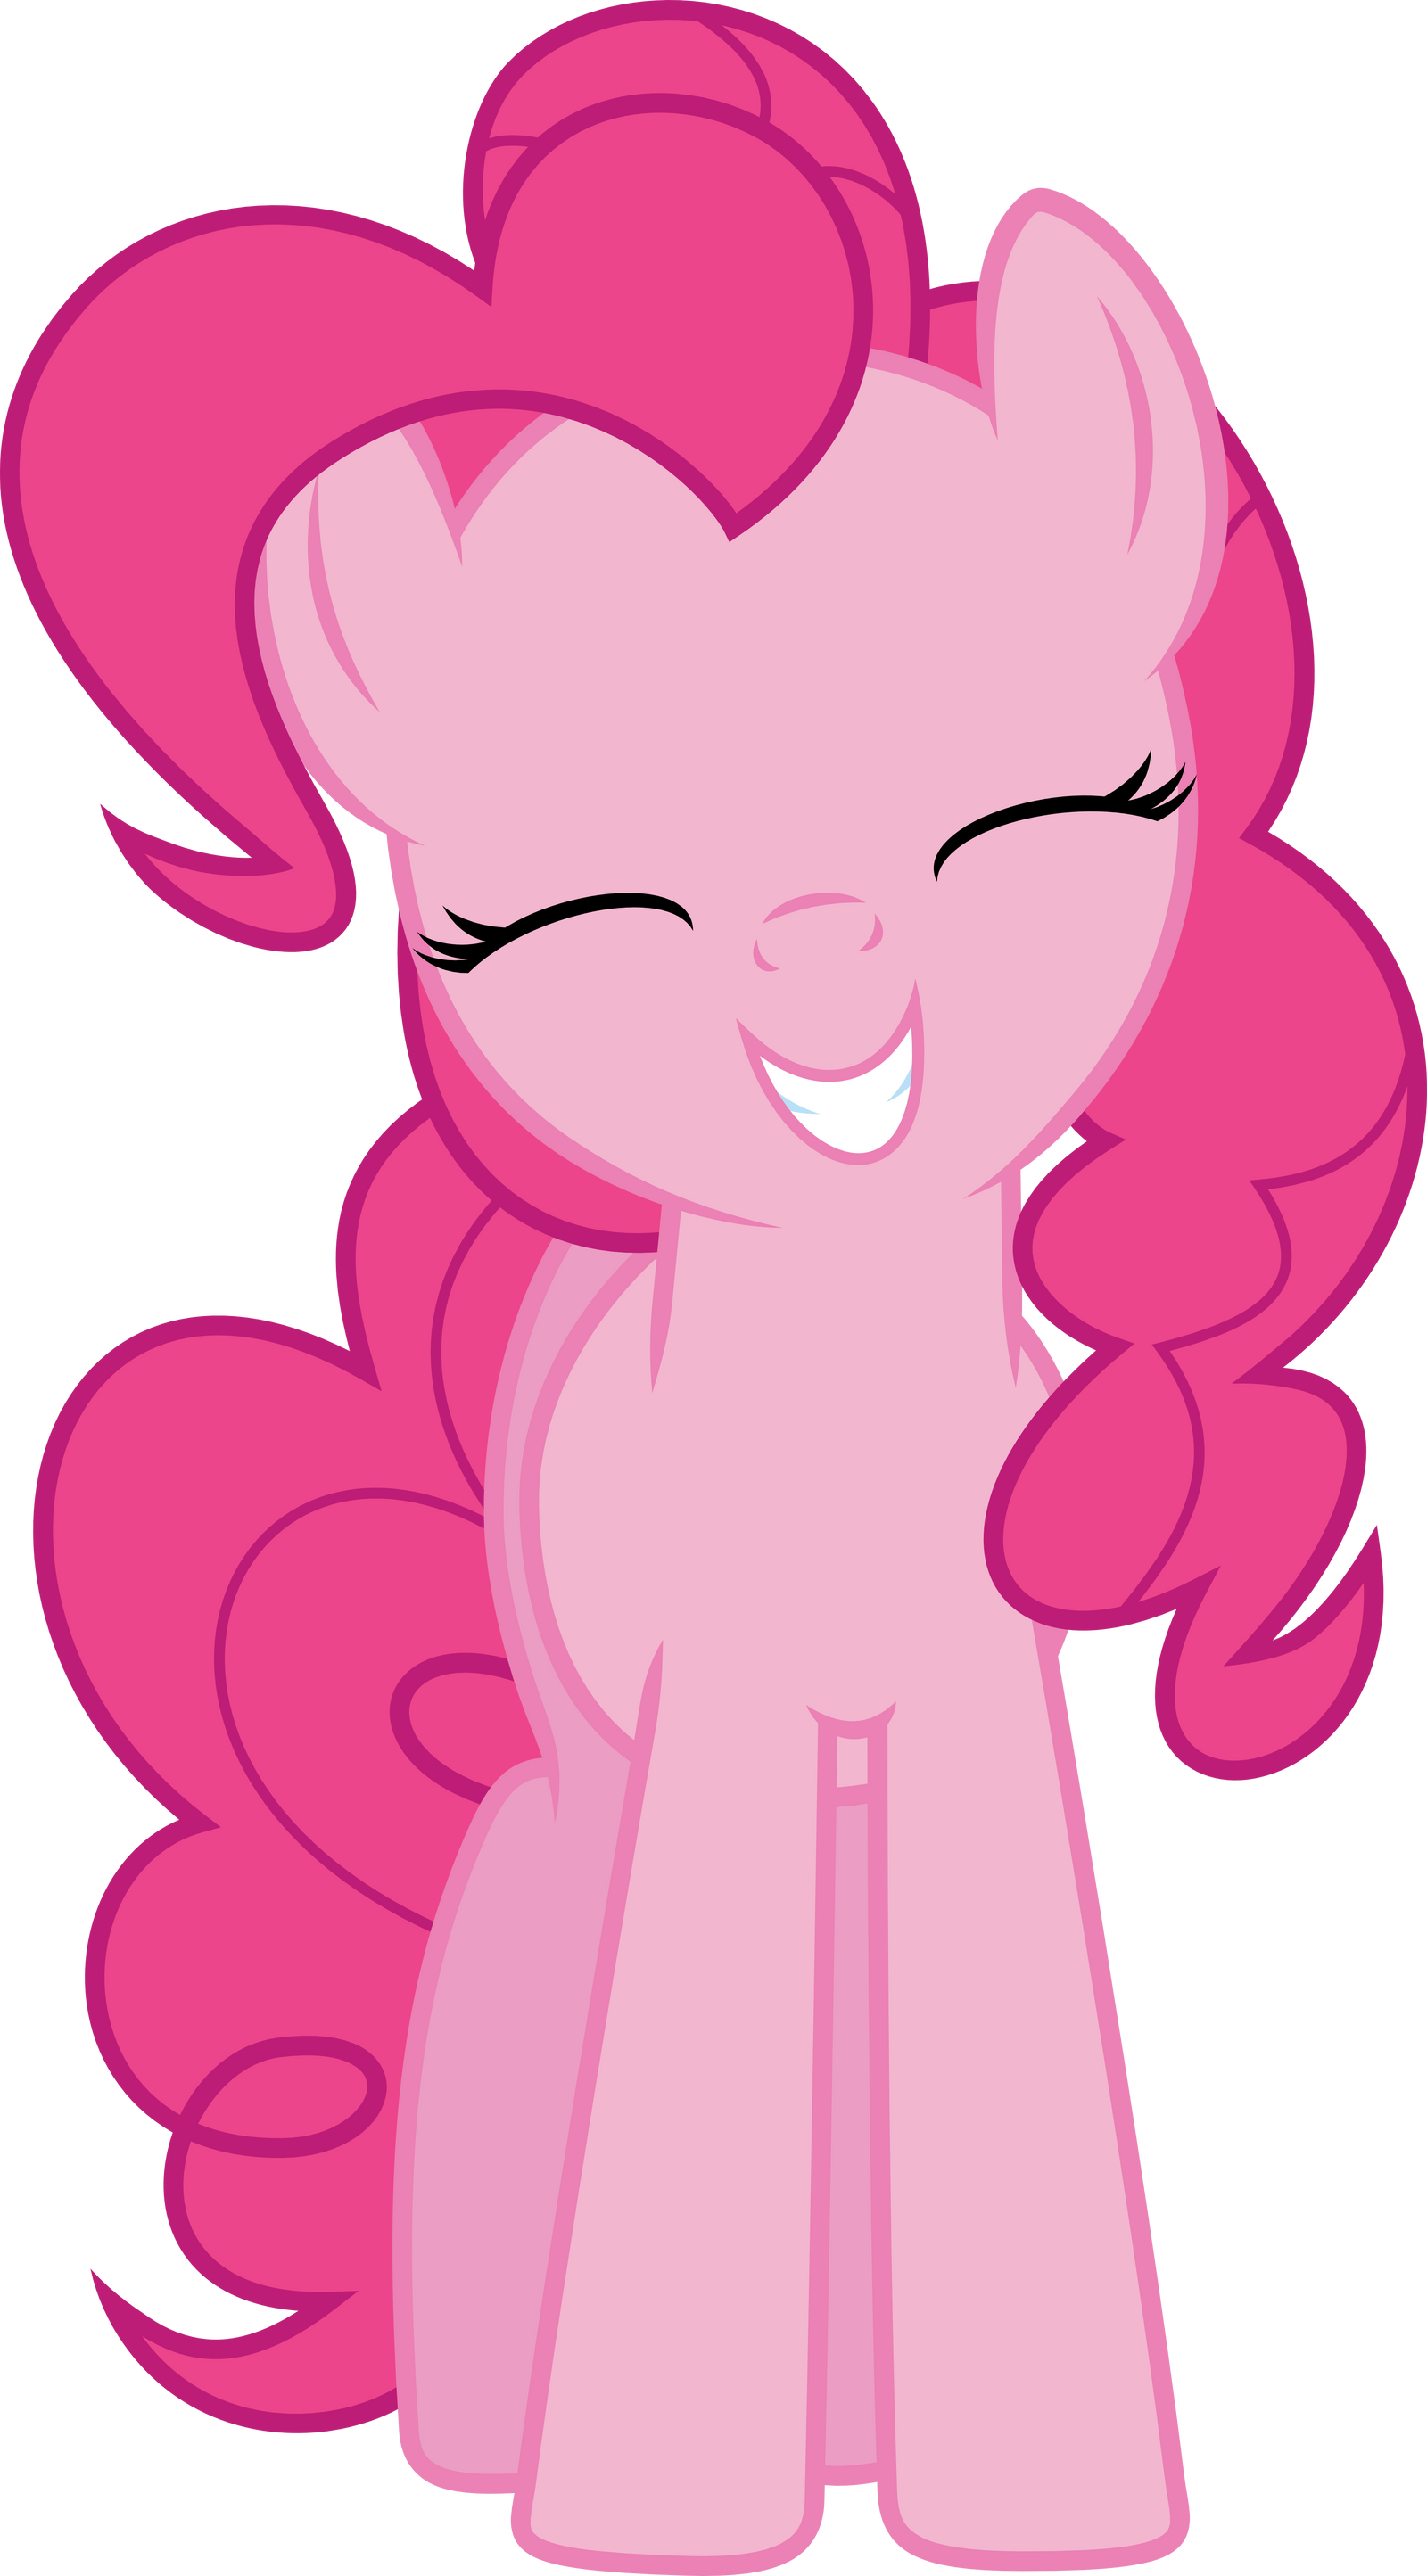 Pinkie Pie 2 by xPesifeindx